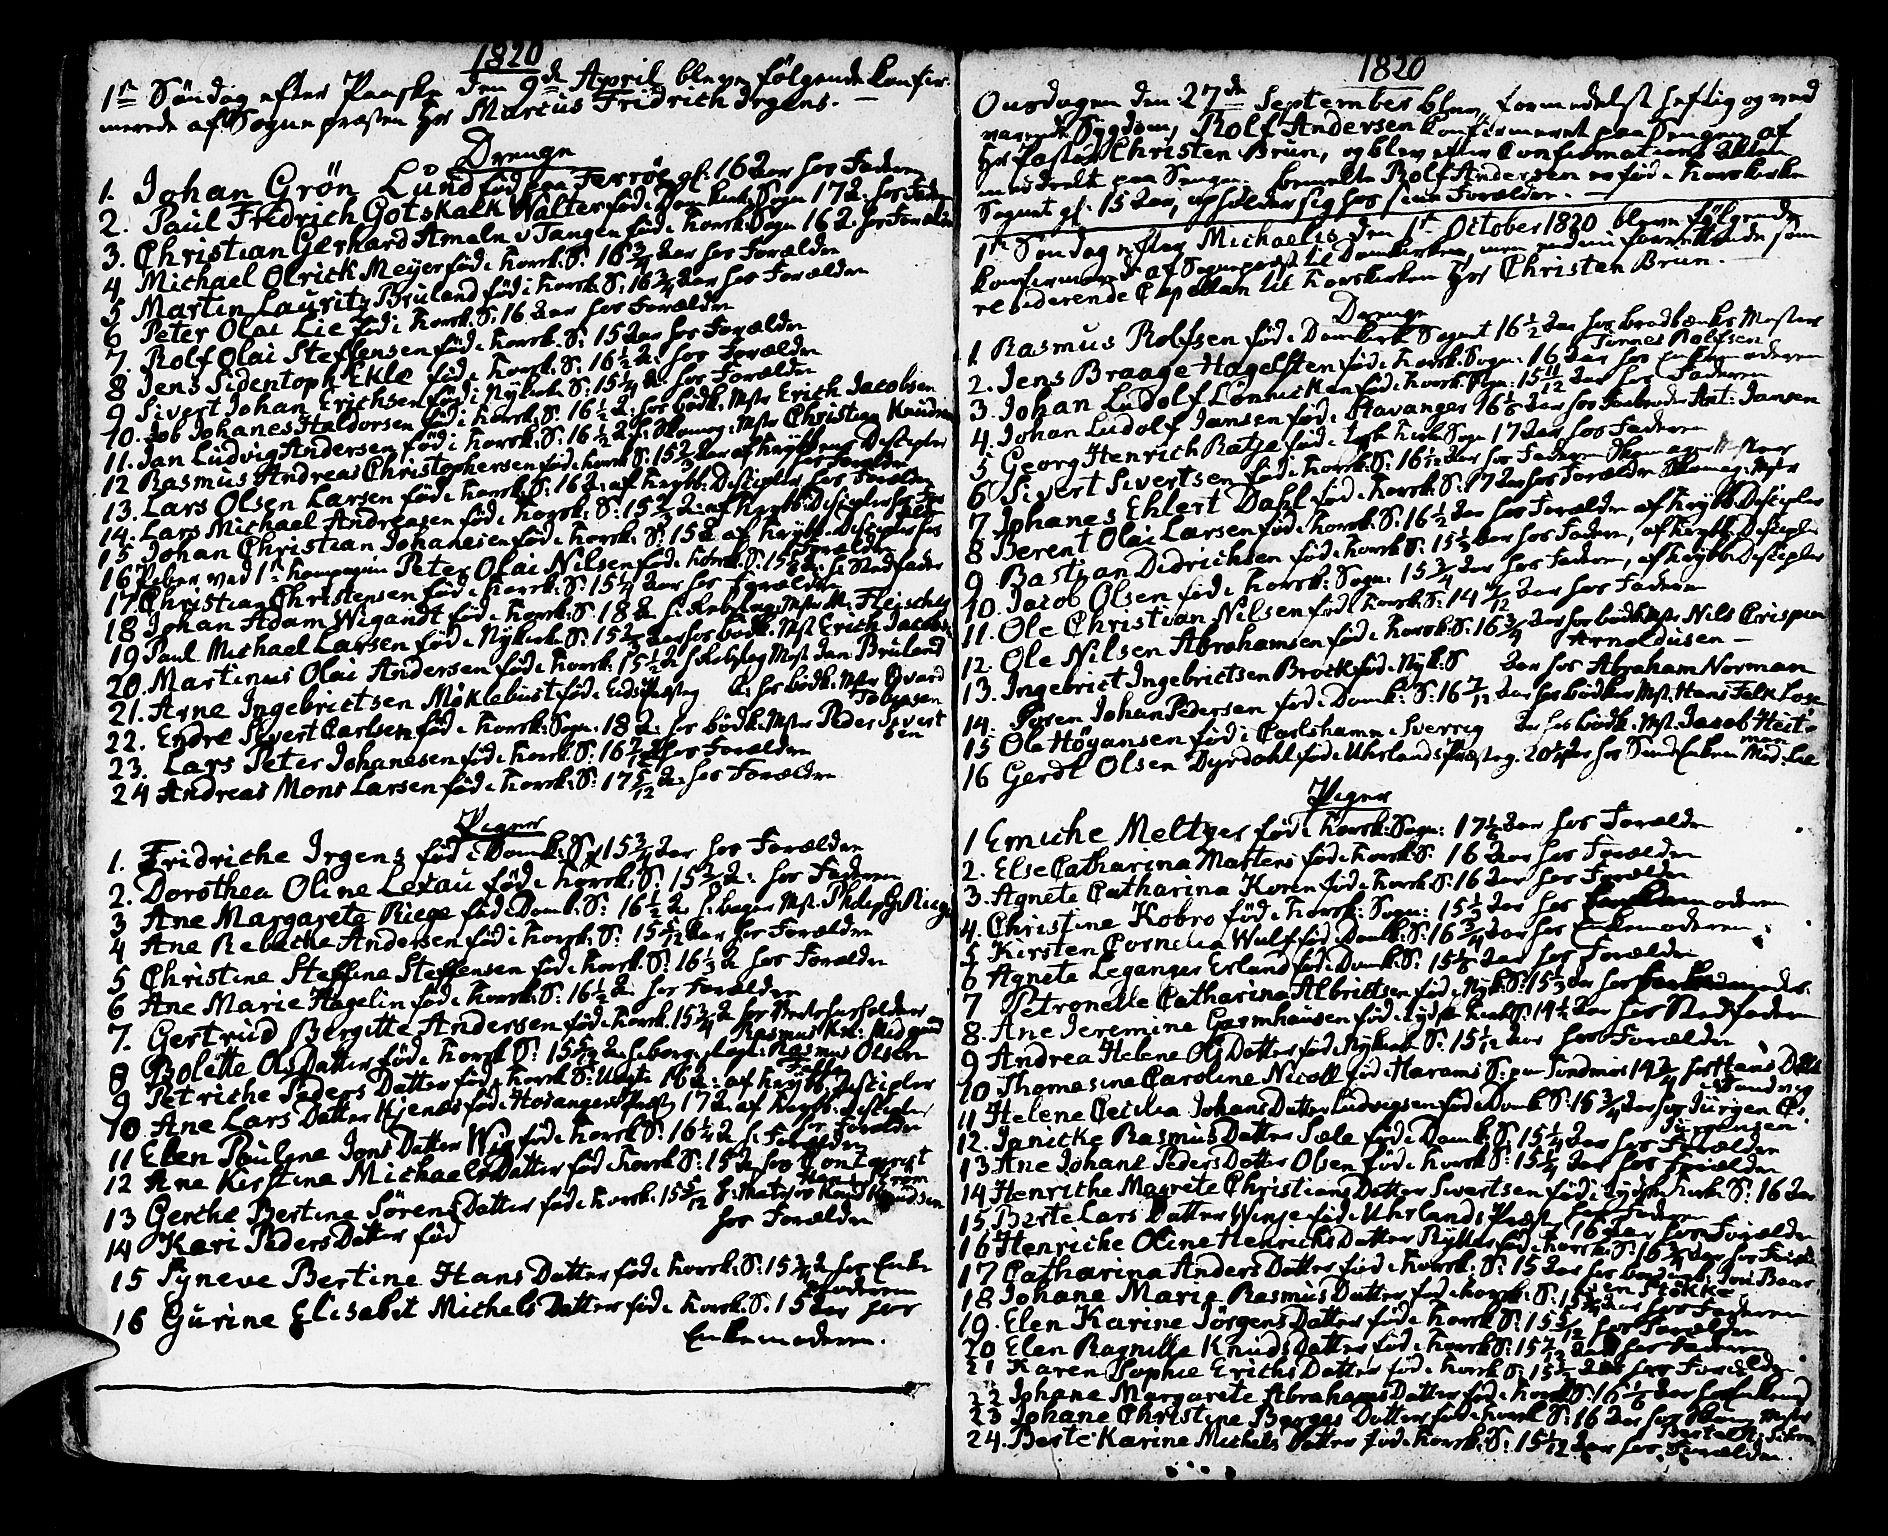 SAB, Korskirken Sokneprestembete, H/Haa/L0007: Ministerialbok nr. A 7, 1736-1839, s. 117